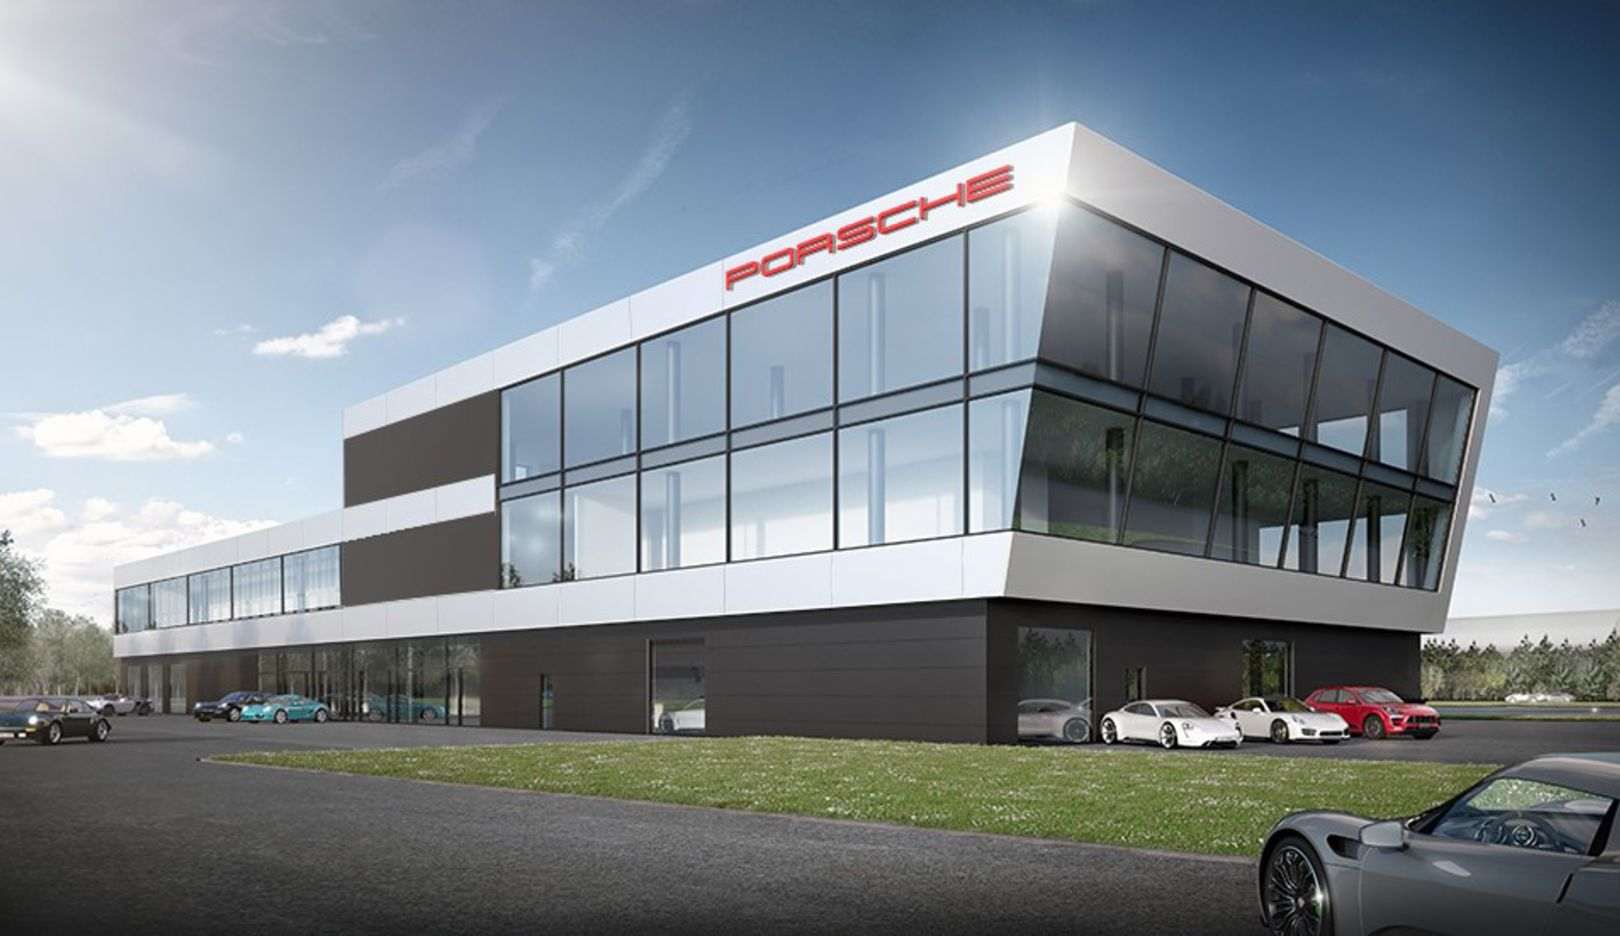 Porsche Experience Center, Hockenheimring, 2018, Porsche AG